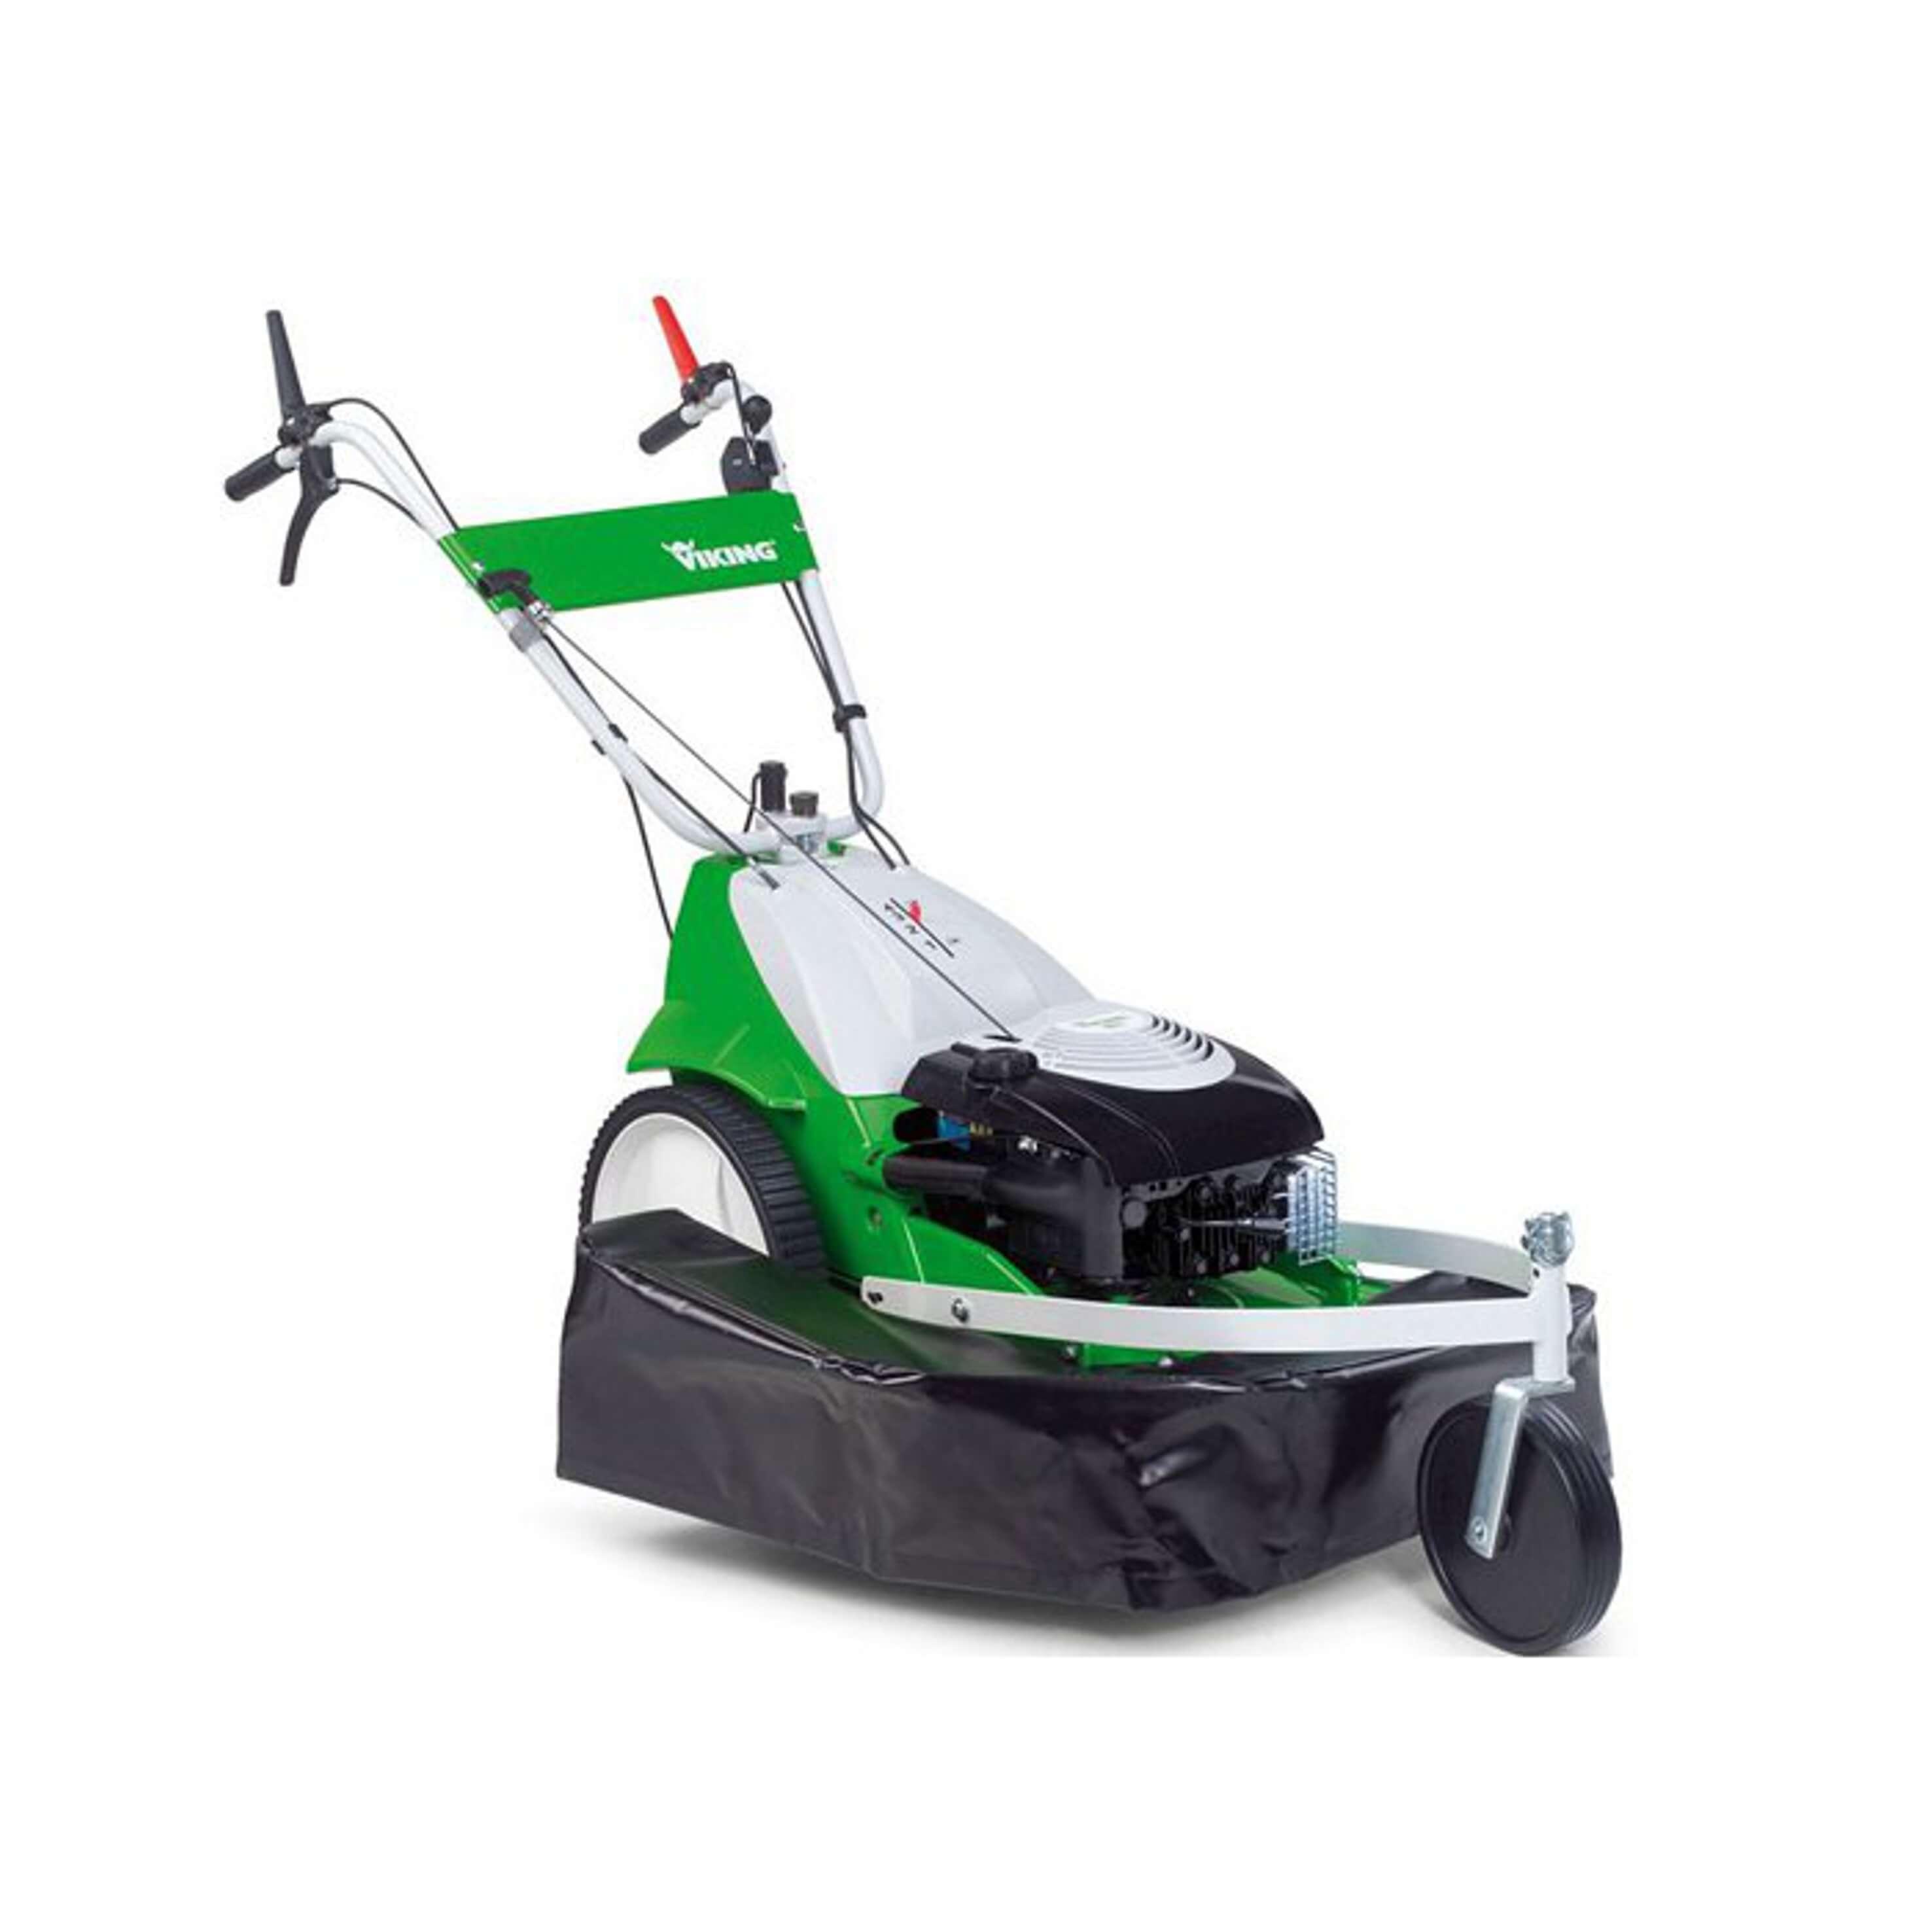 Viking MB 6.1 RV Petrol Lawn Mowers